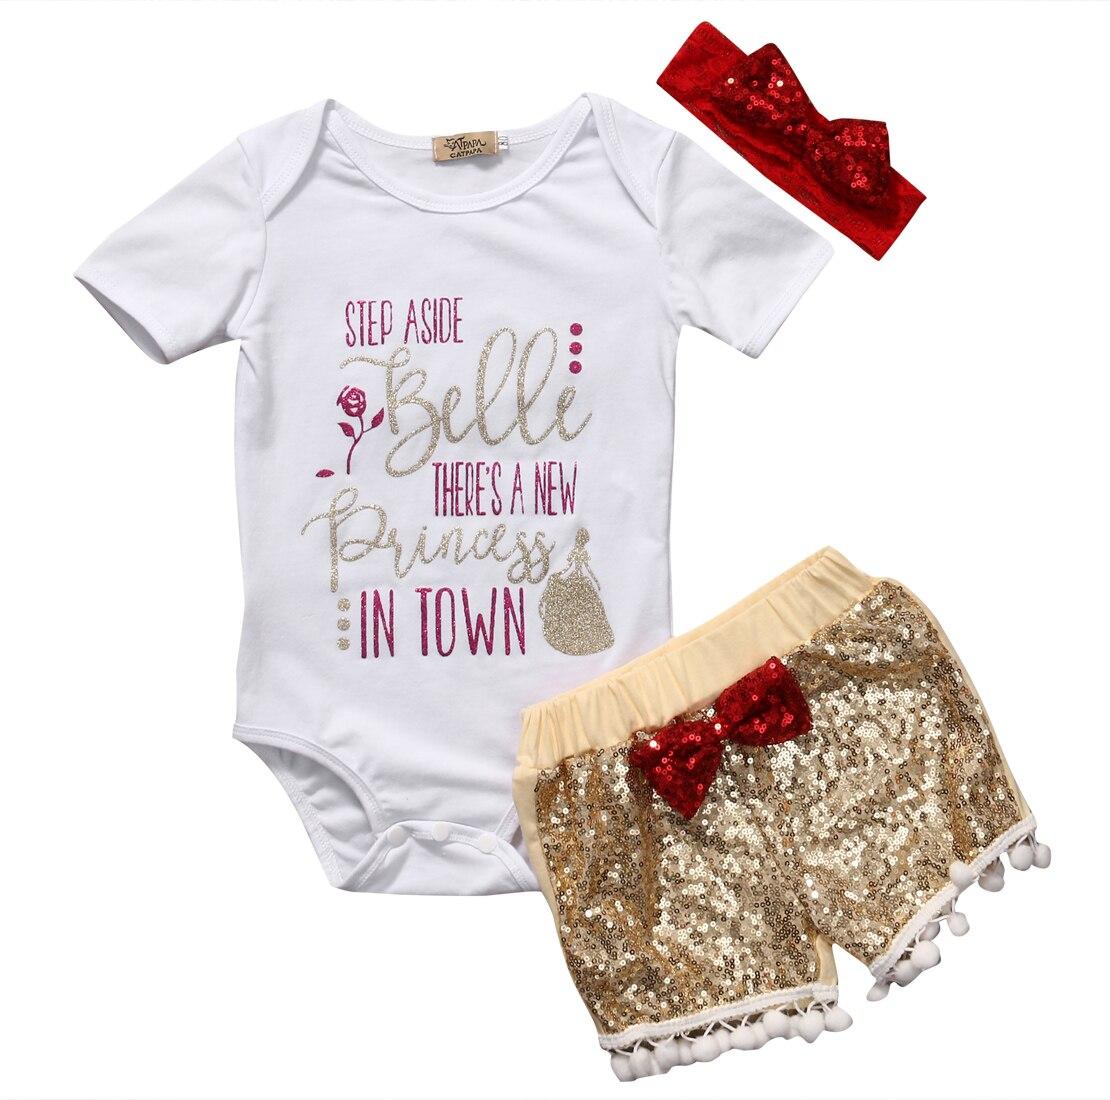 Summer 2017 3PCS Kids Baby Girls Boys Tops Short Sleeves Romper + Bling Bling Short Pants Headband Outfits Set Clothes 0-24M